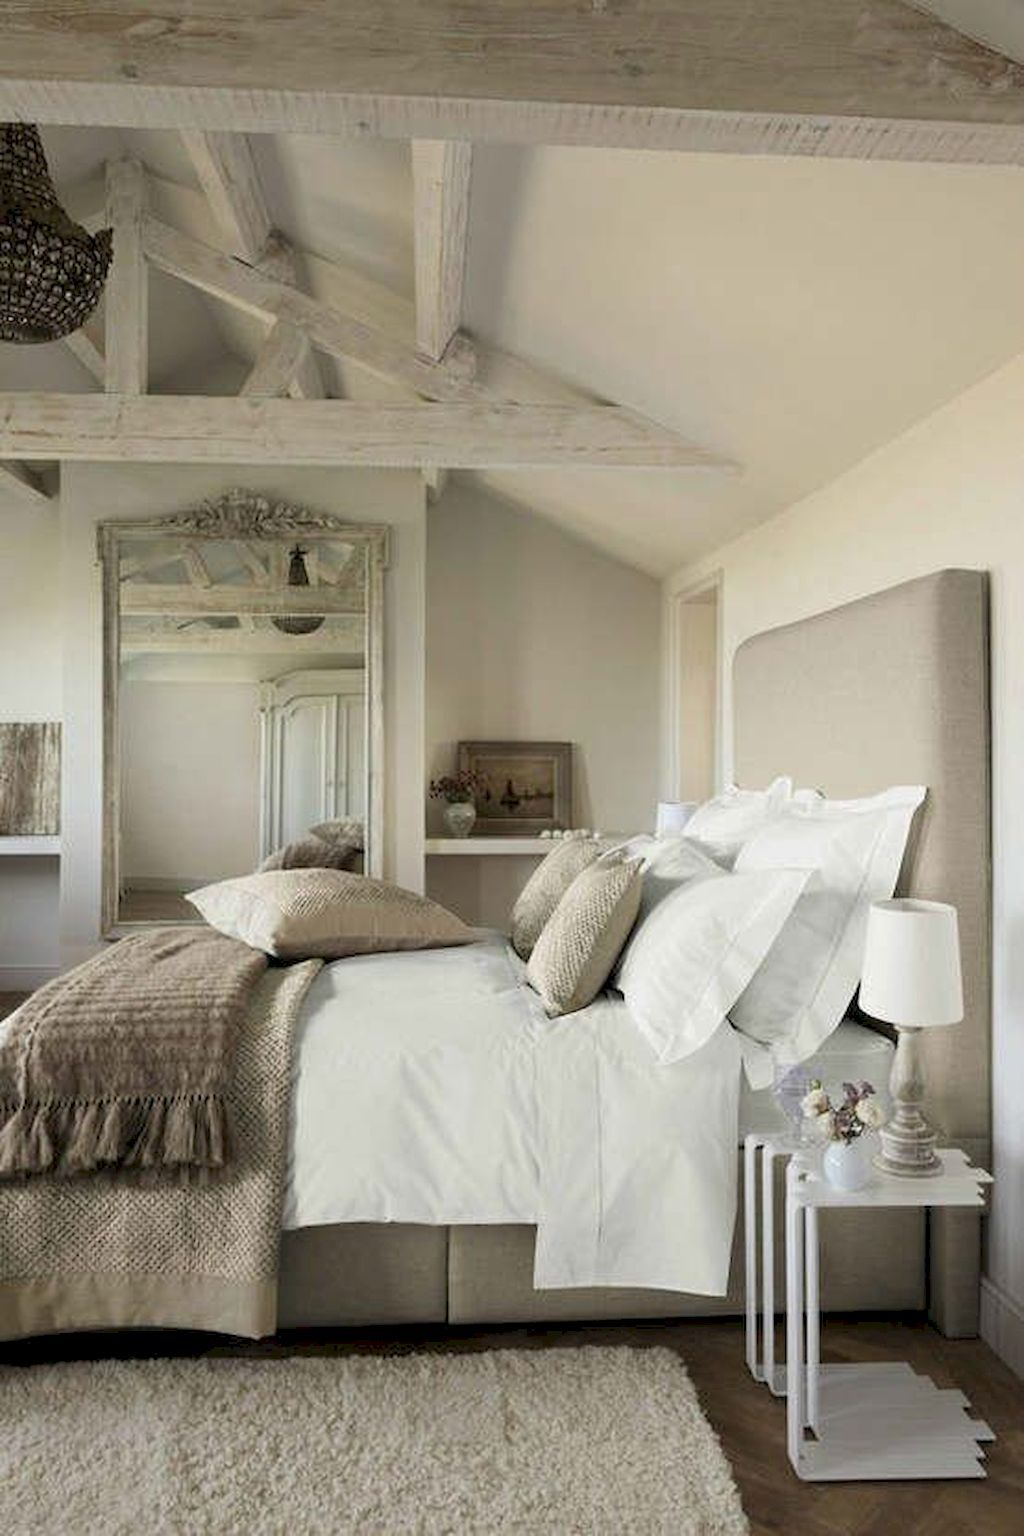 Master bedroom decorating ideas   Rustic Master Bedroom Farmhouse Style Remodel Ideas  Master